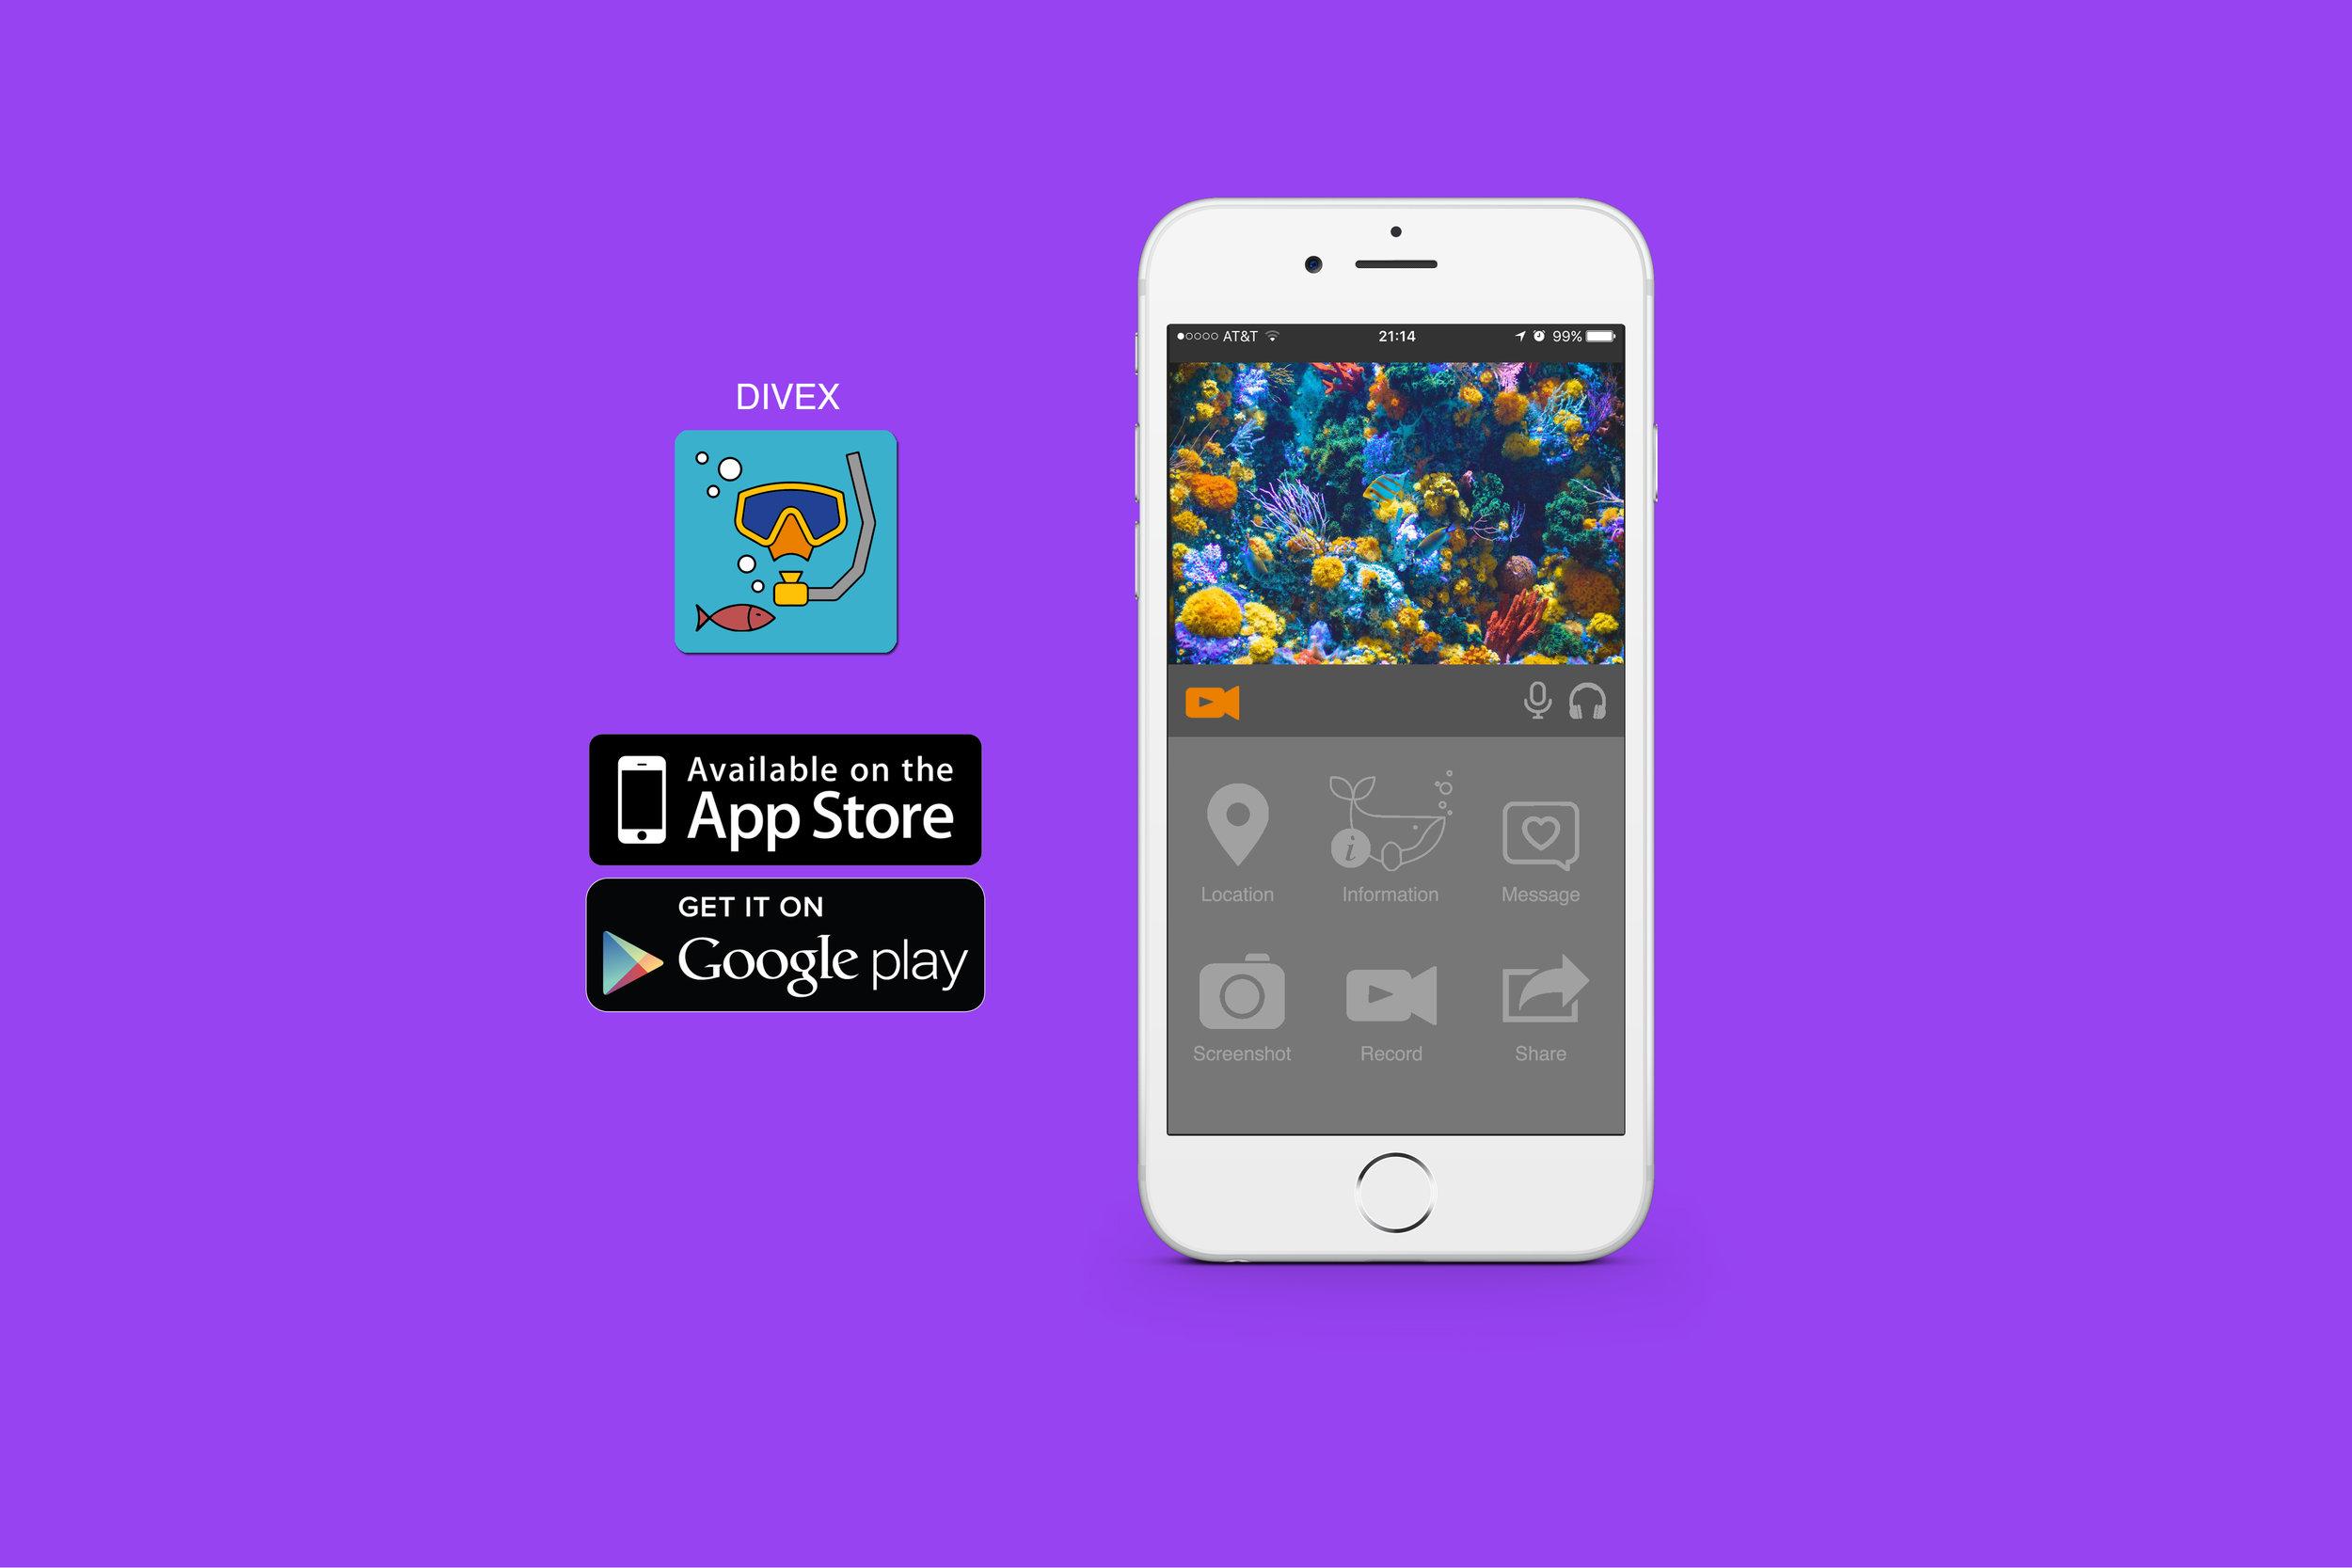 Jewel_Tolbert_DiveX App.jpg